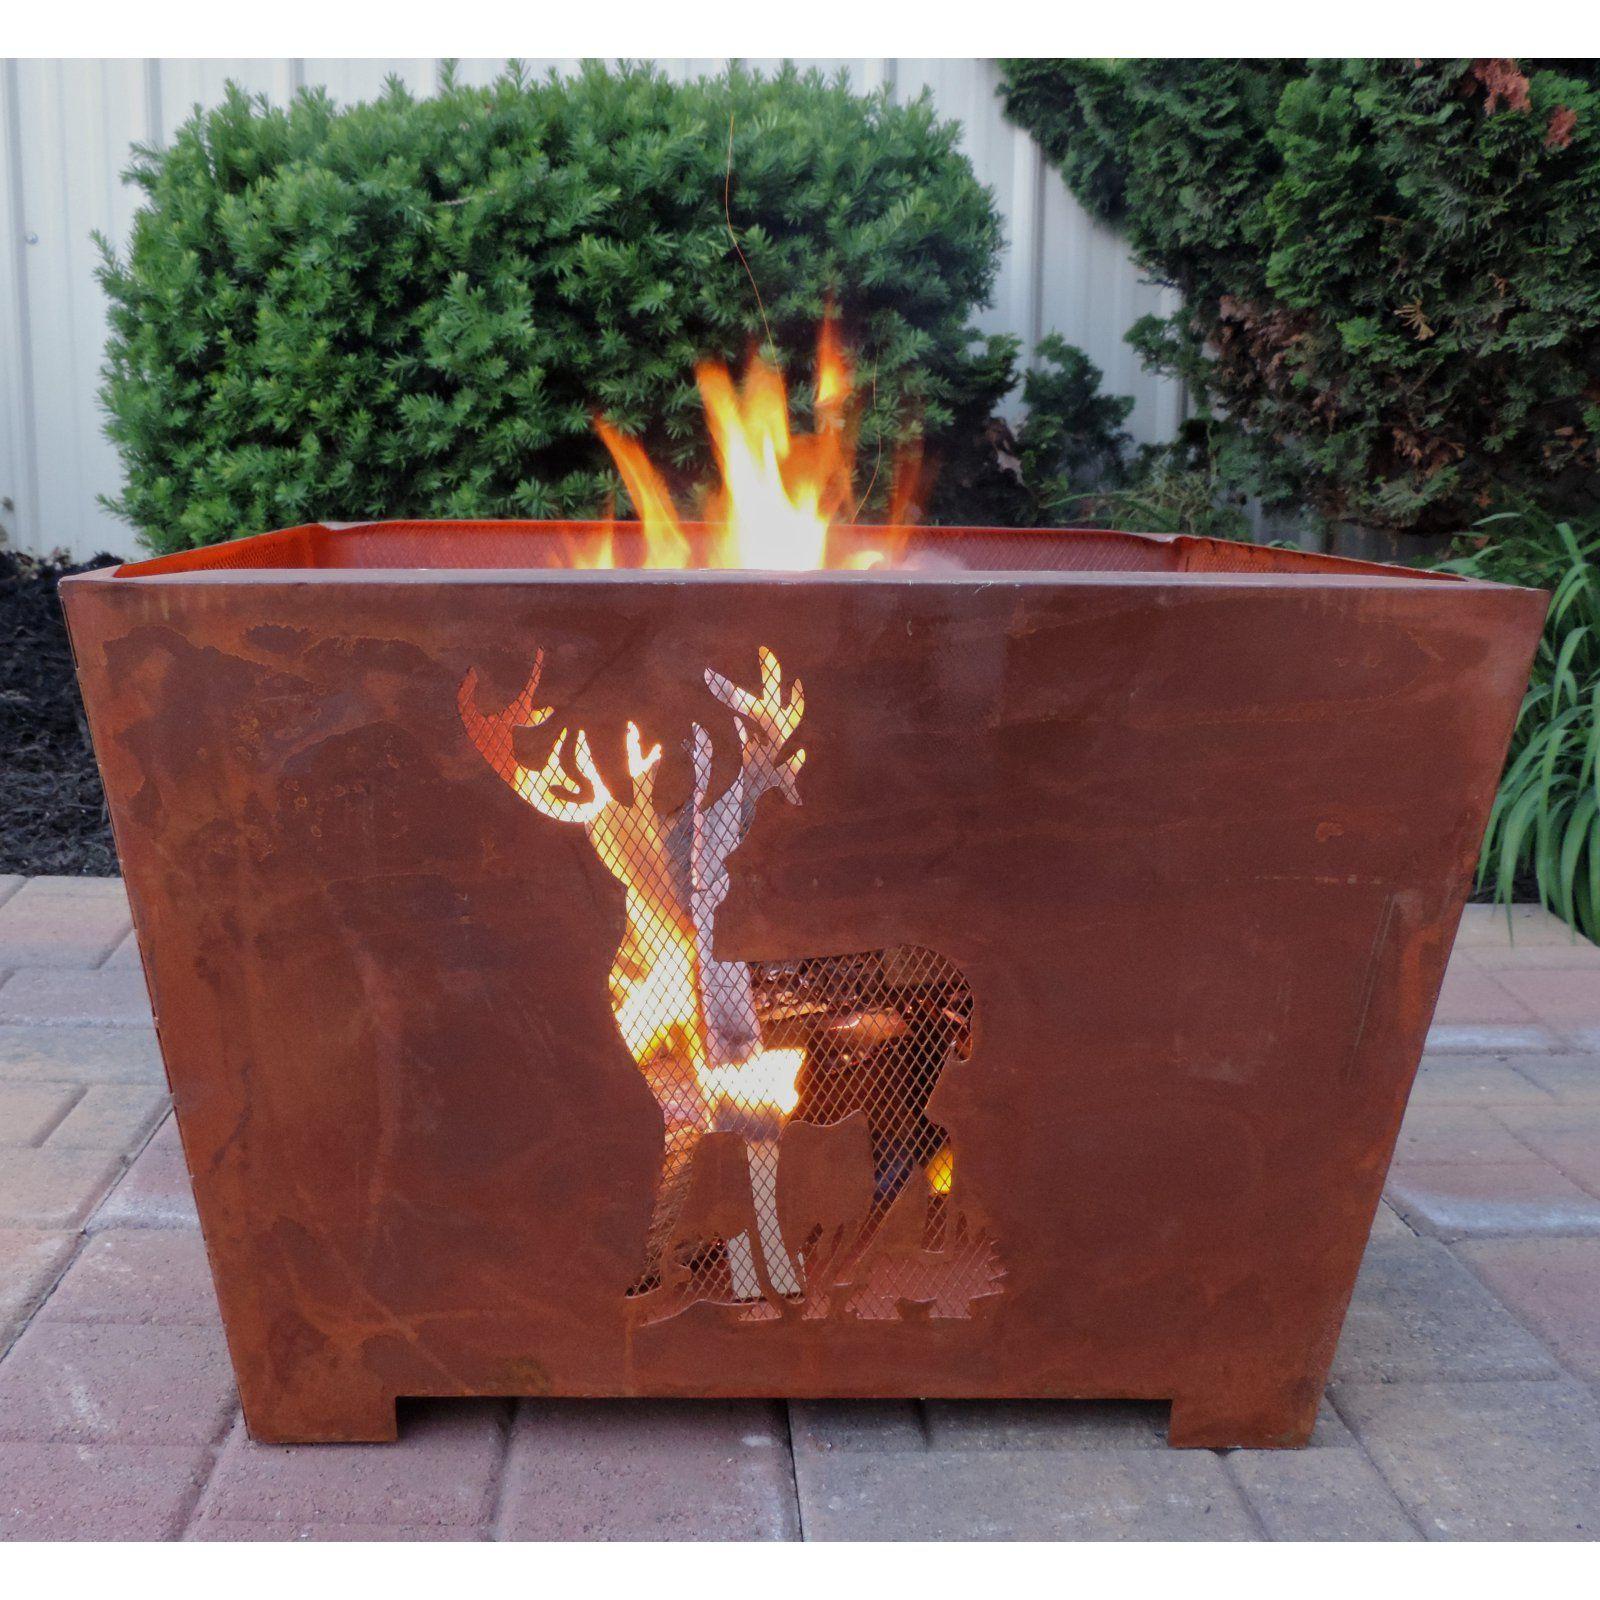 Esschert Design Nature Scene 23 5 In Fire Pit With Images Wood Burning Fire Pit Wood Burning Fires Fire Pit